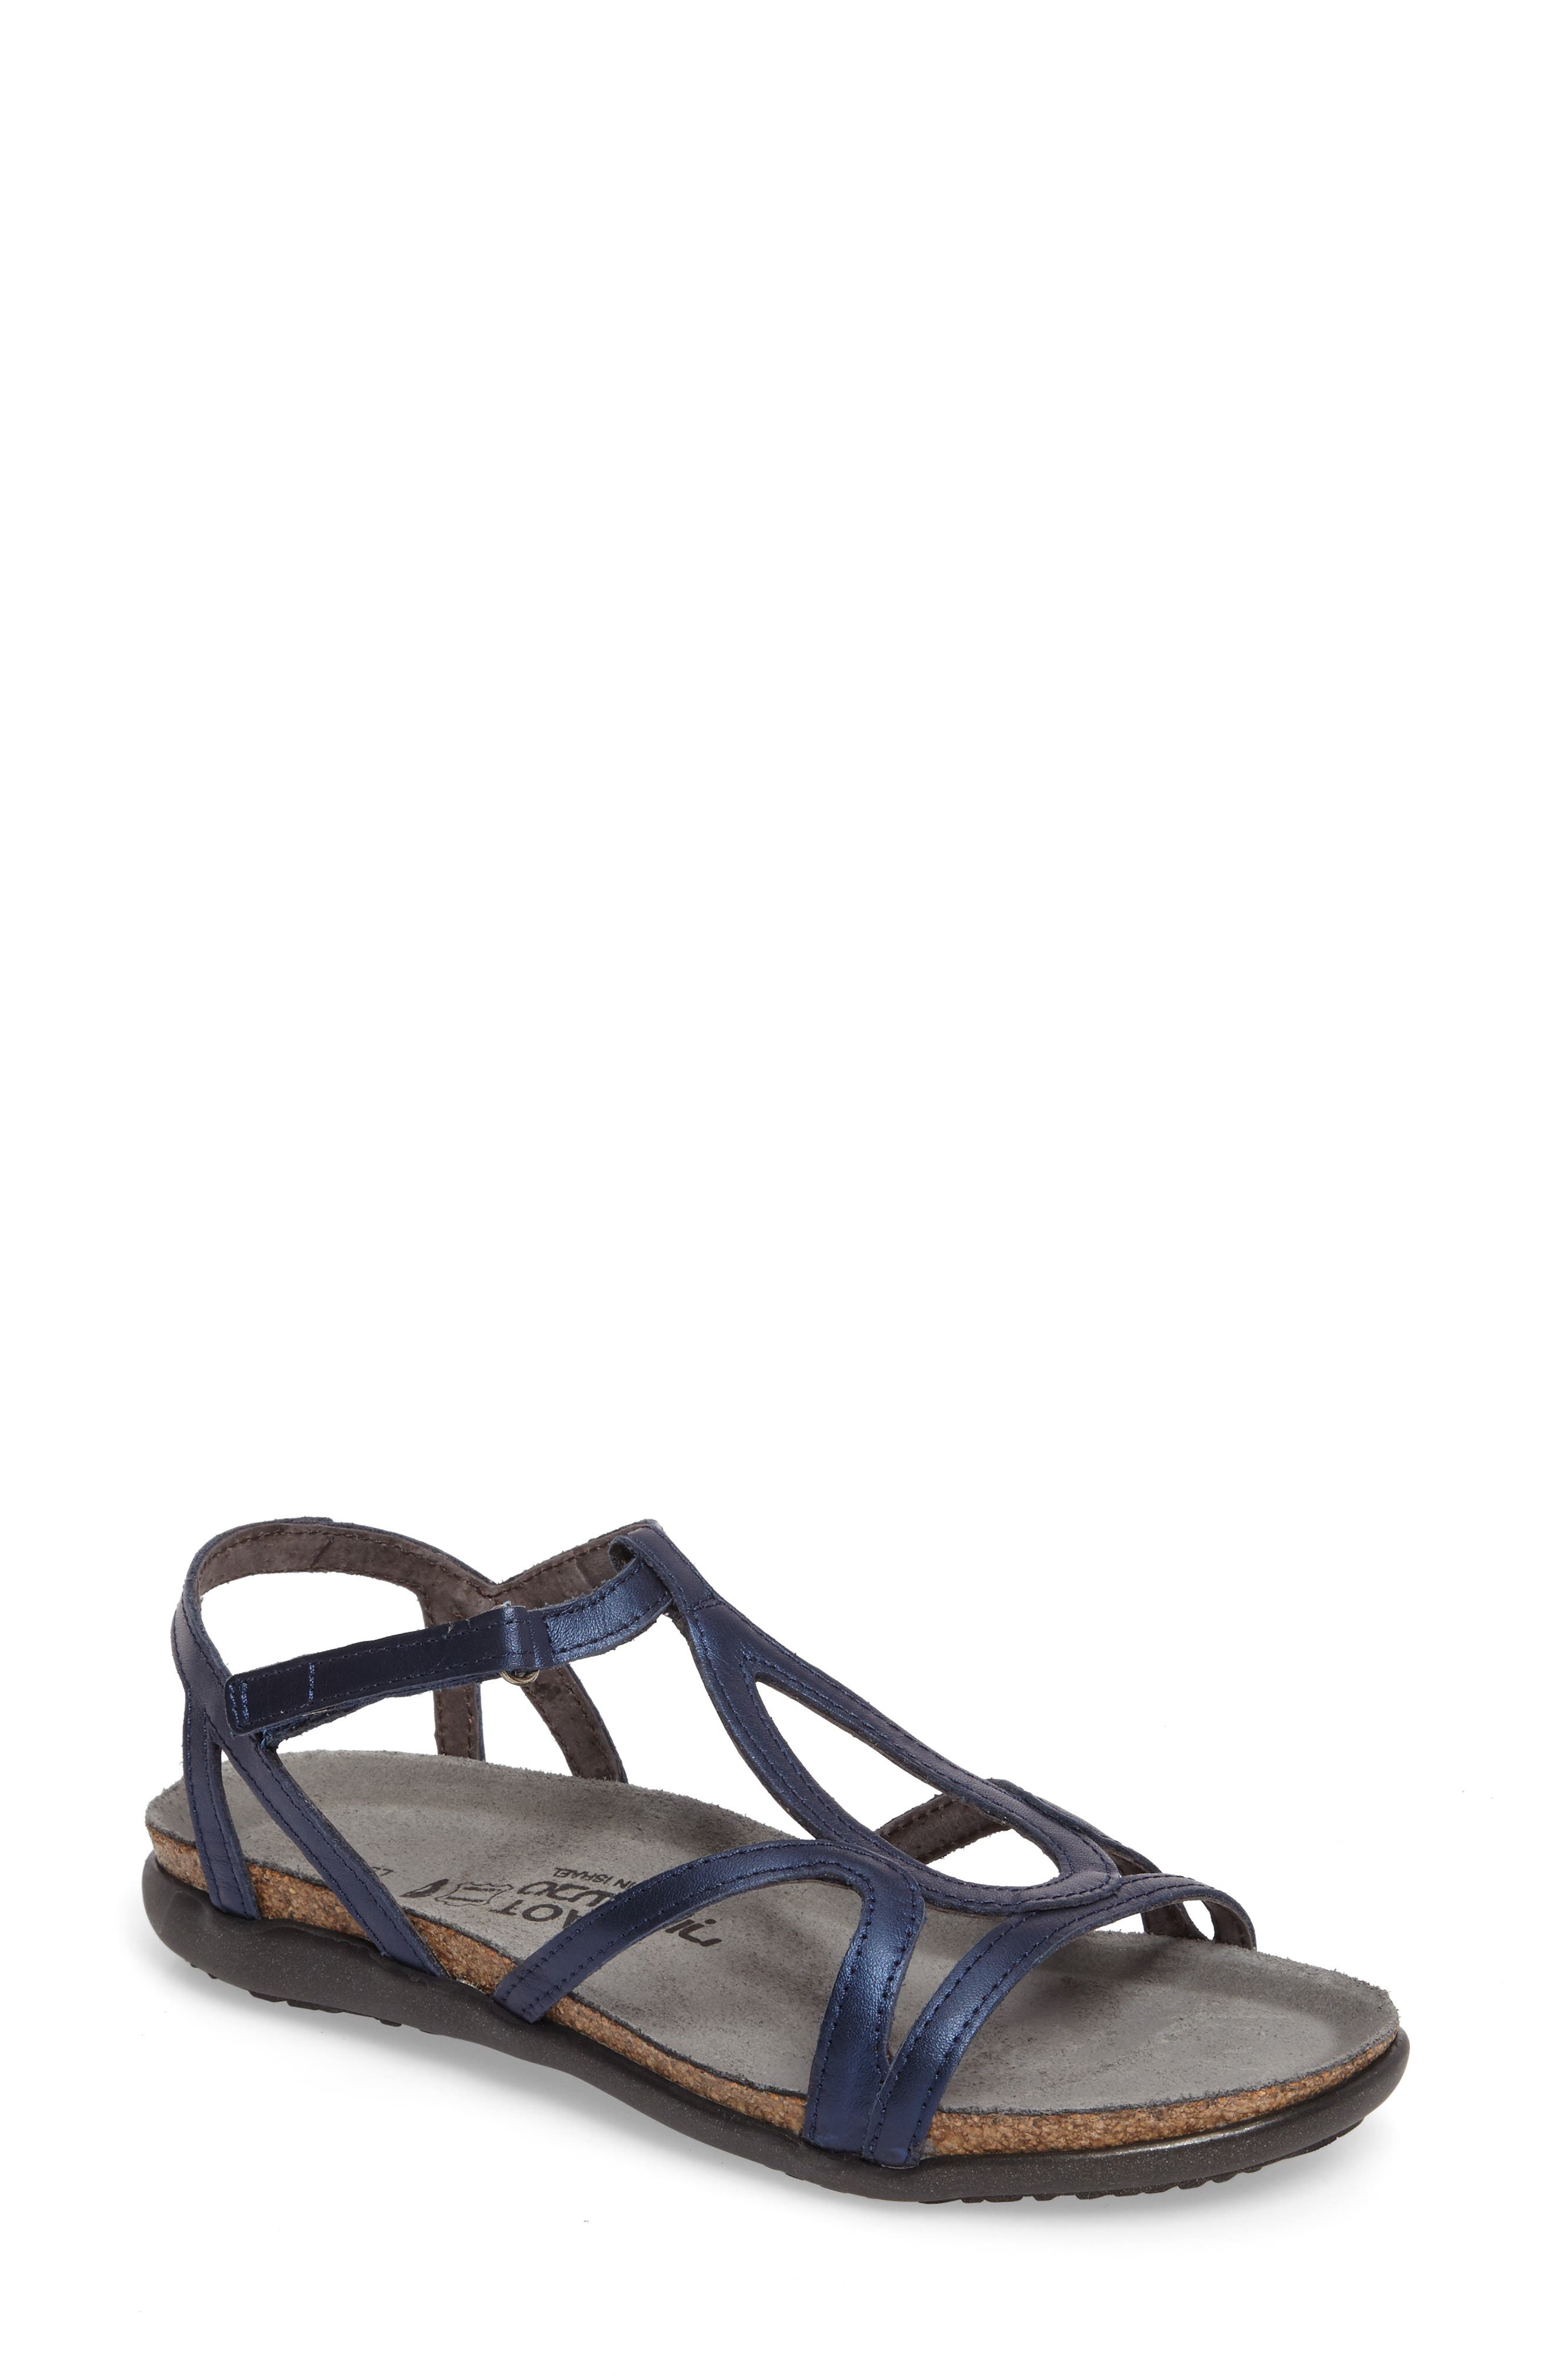 'Dorith' Sandal,                         Main,                         color, POLAR SEA LEATHER